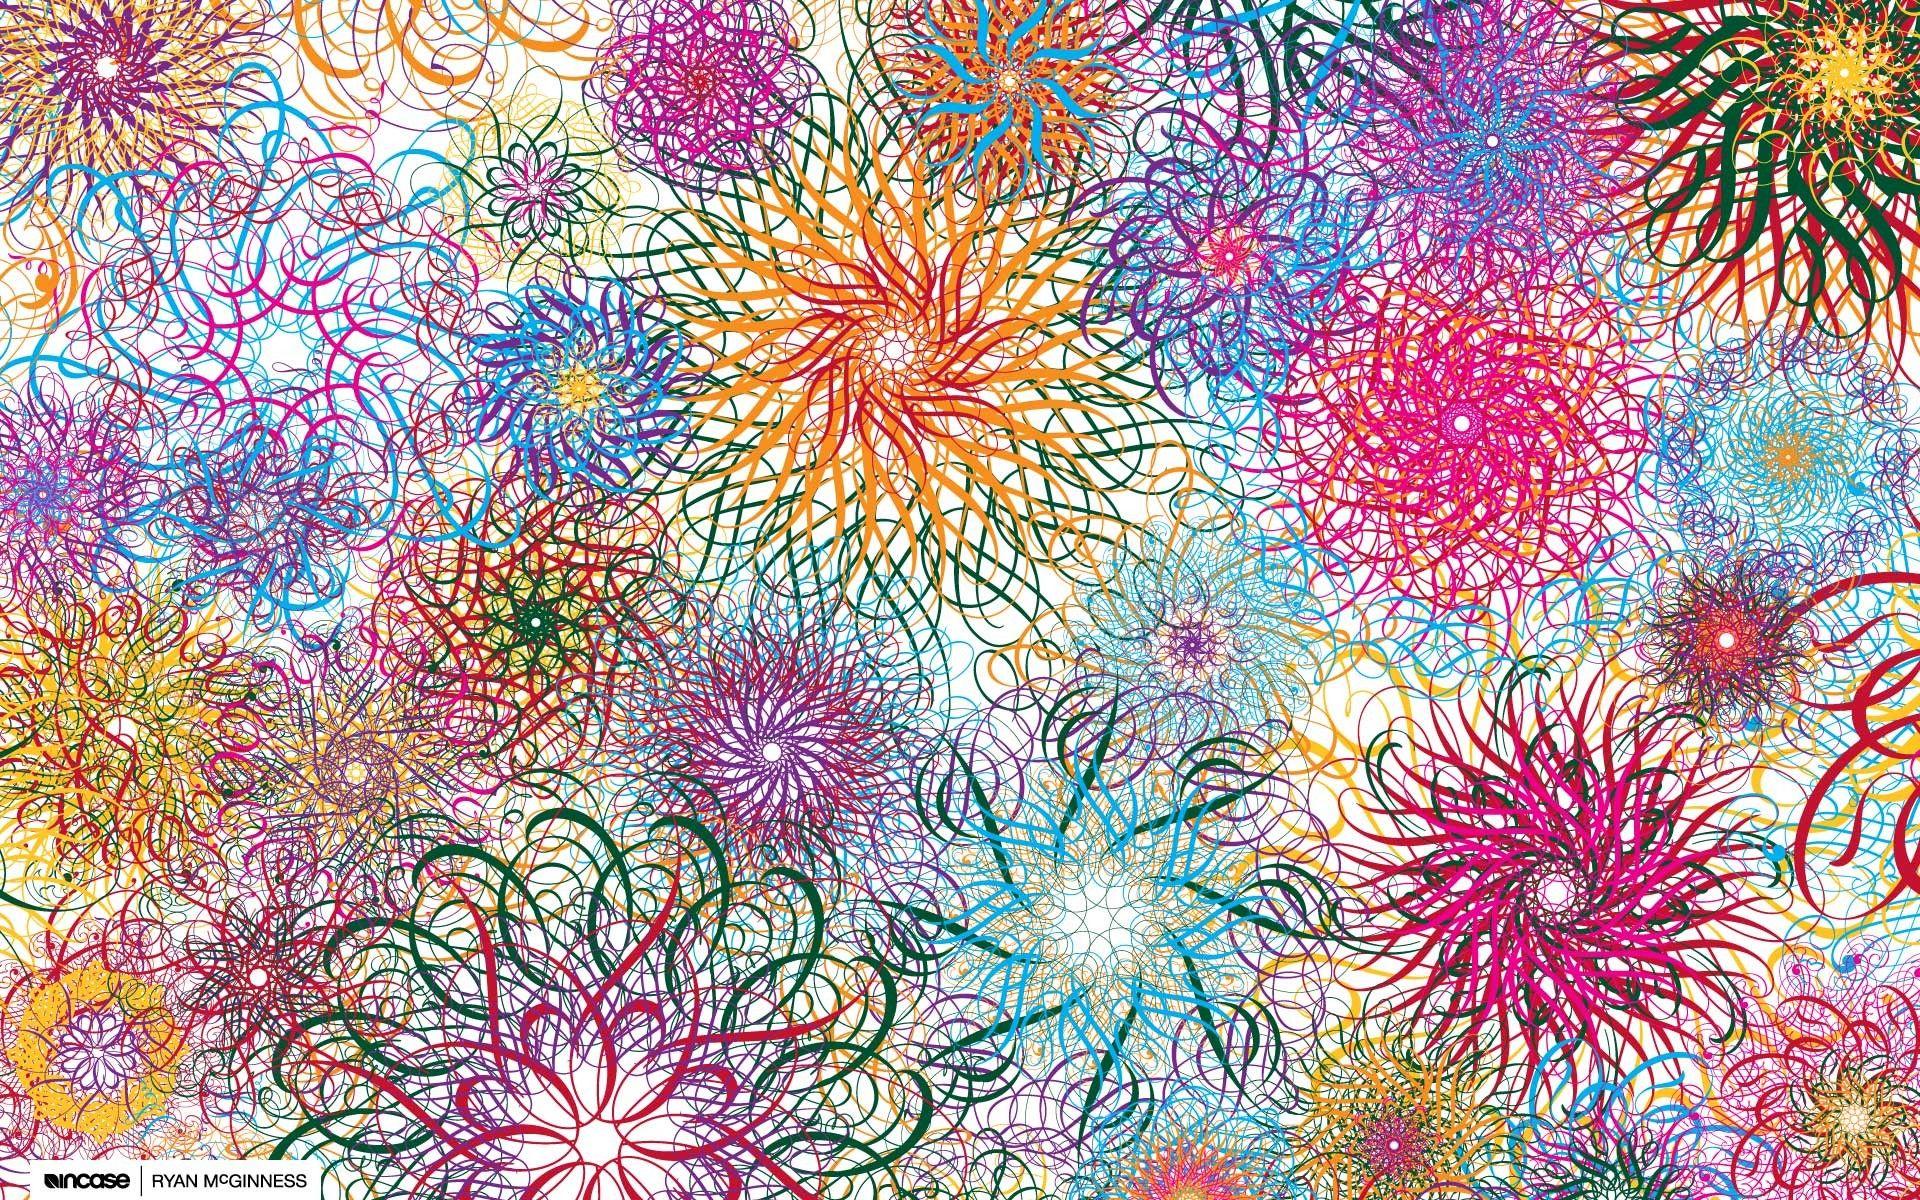 Fondos Abstractos Flores Para Fondo De Pantalla En Hd 1 HD